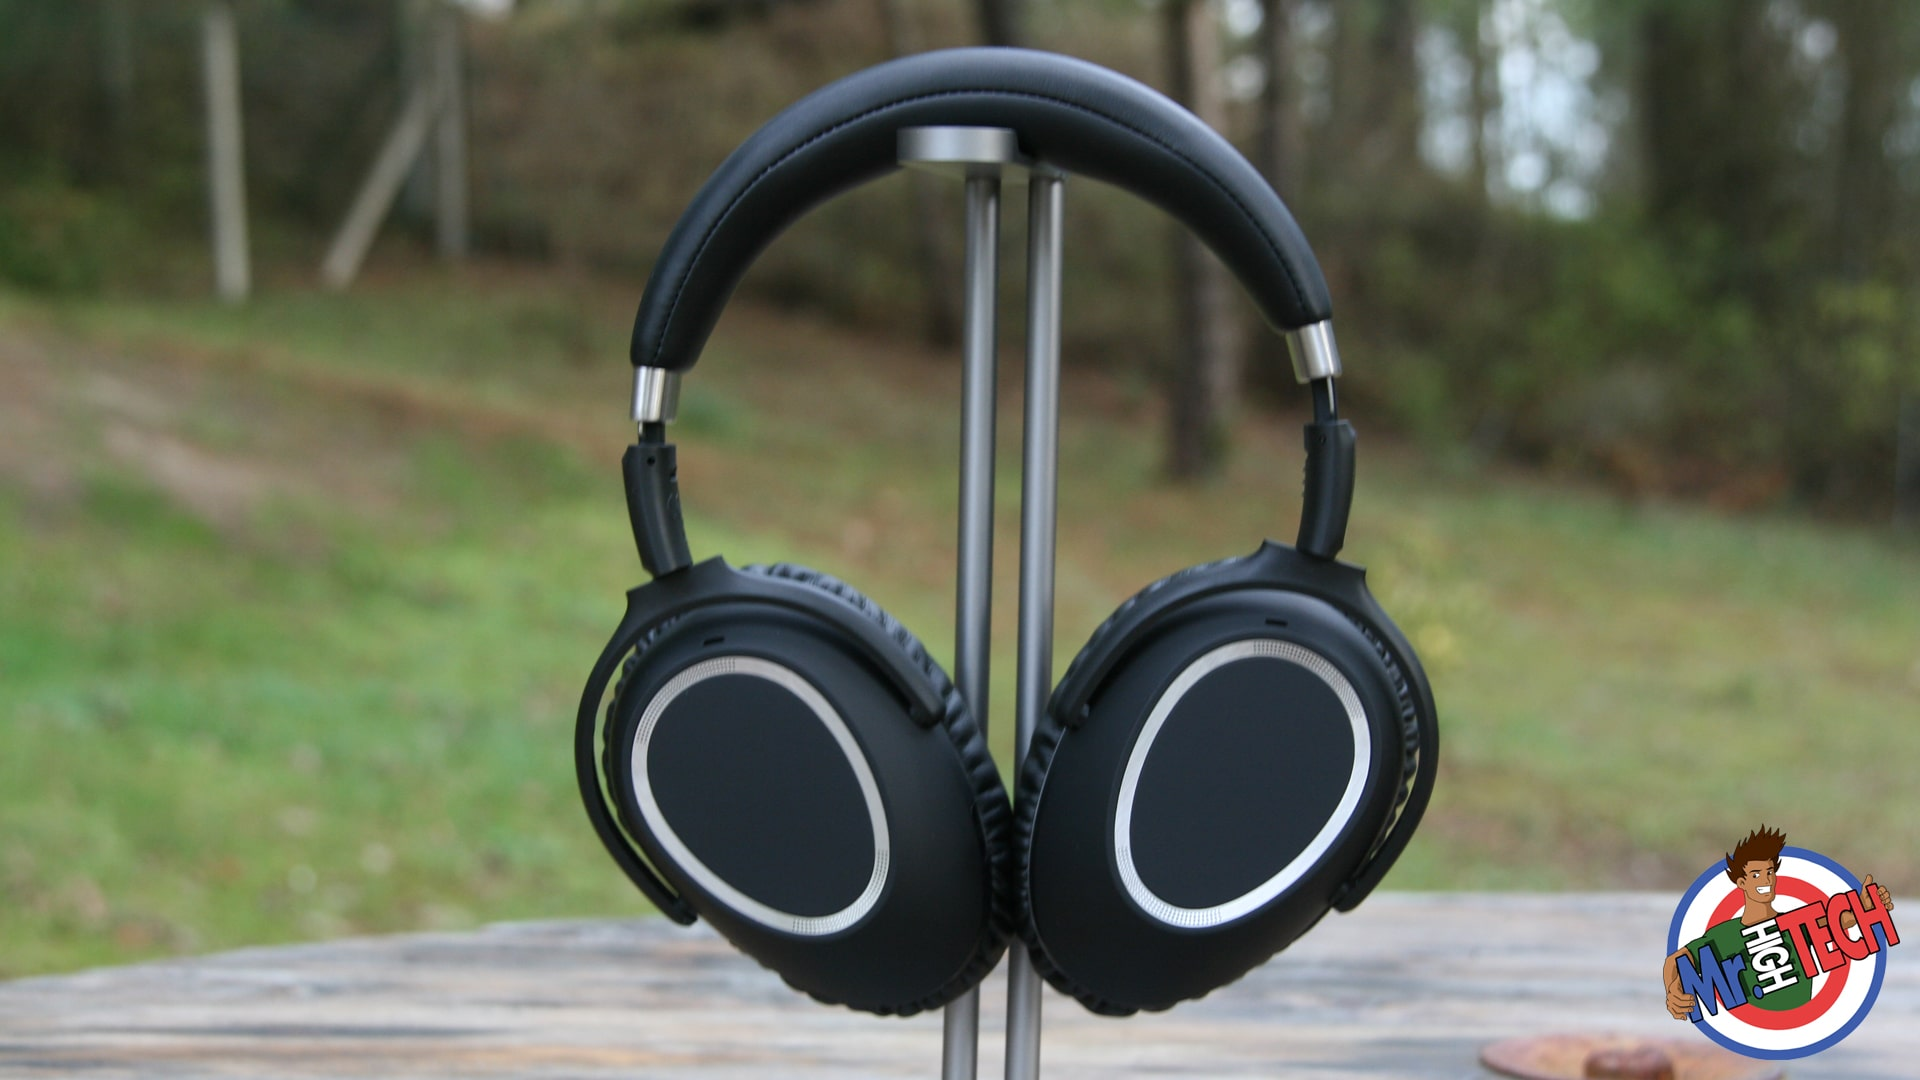 Sennheiser Pxc 550 Test Du Casque Audio Bluetooth Et Avis Complet